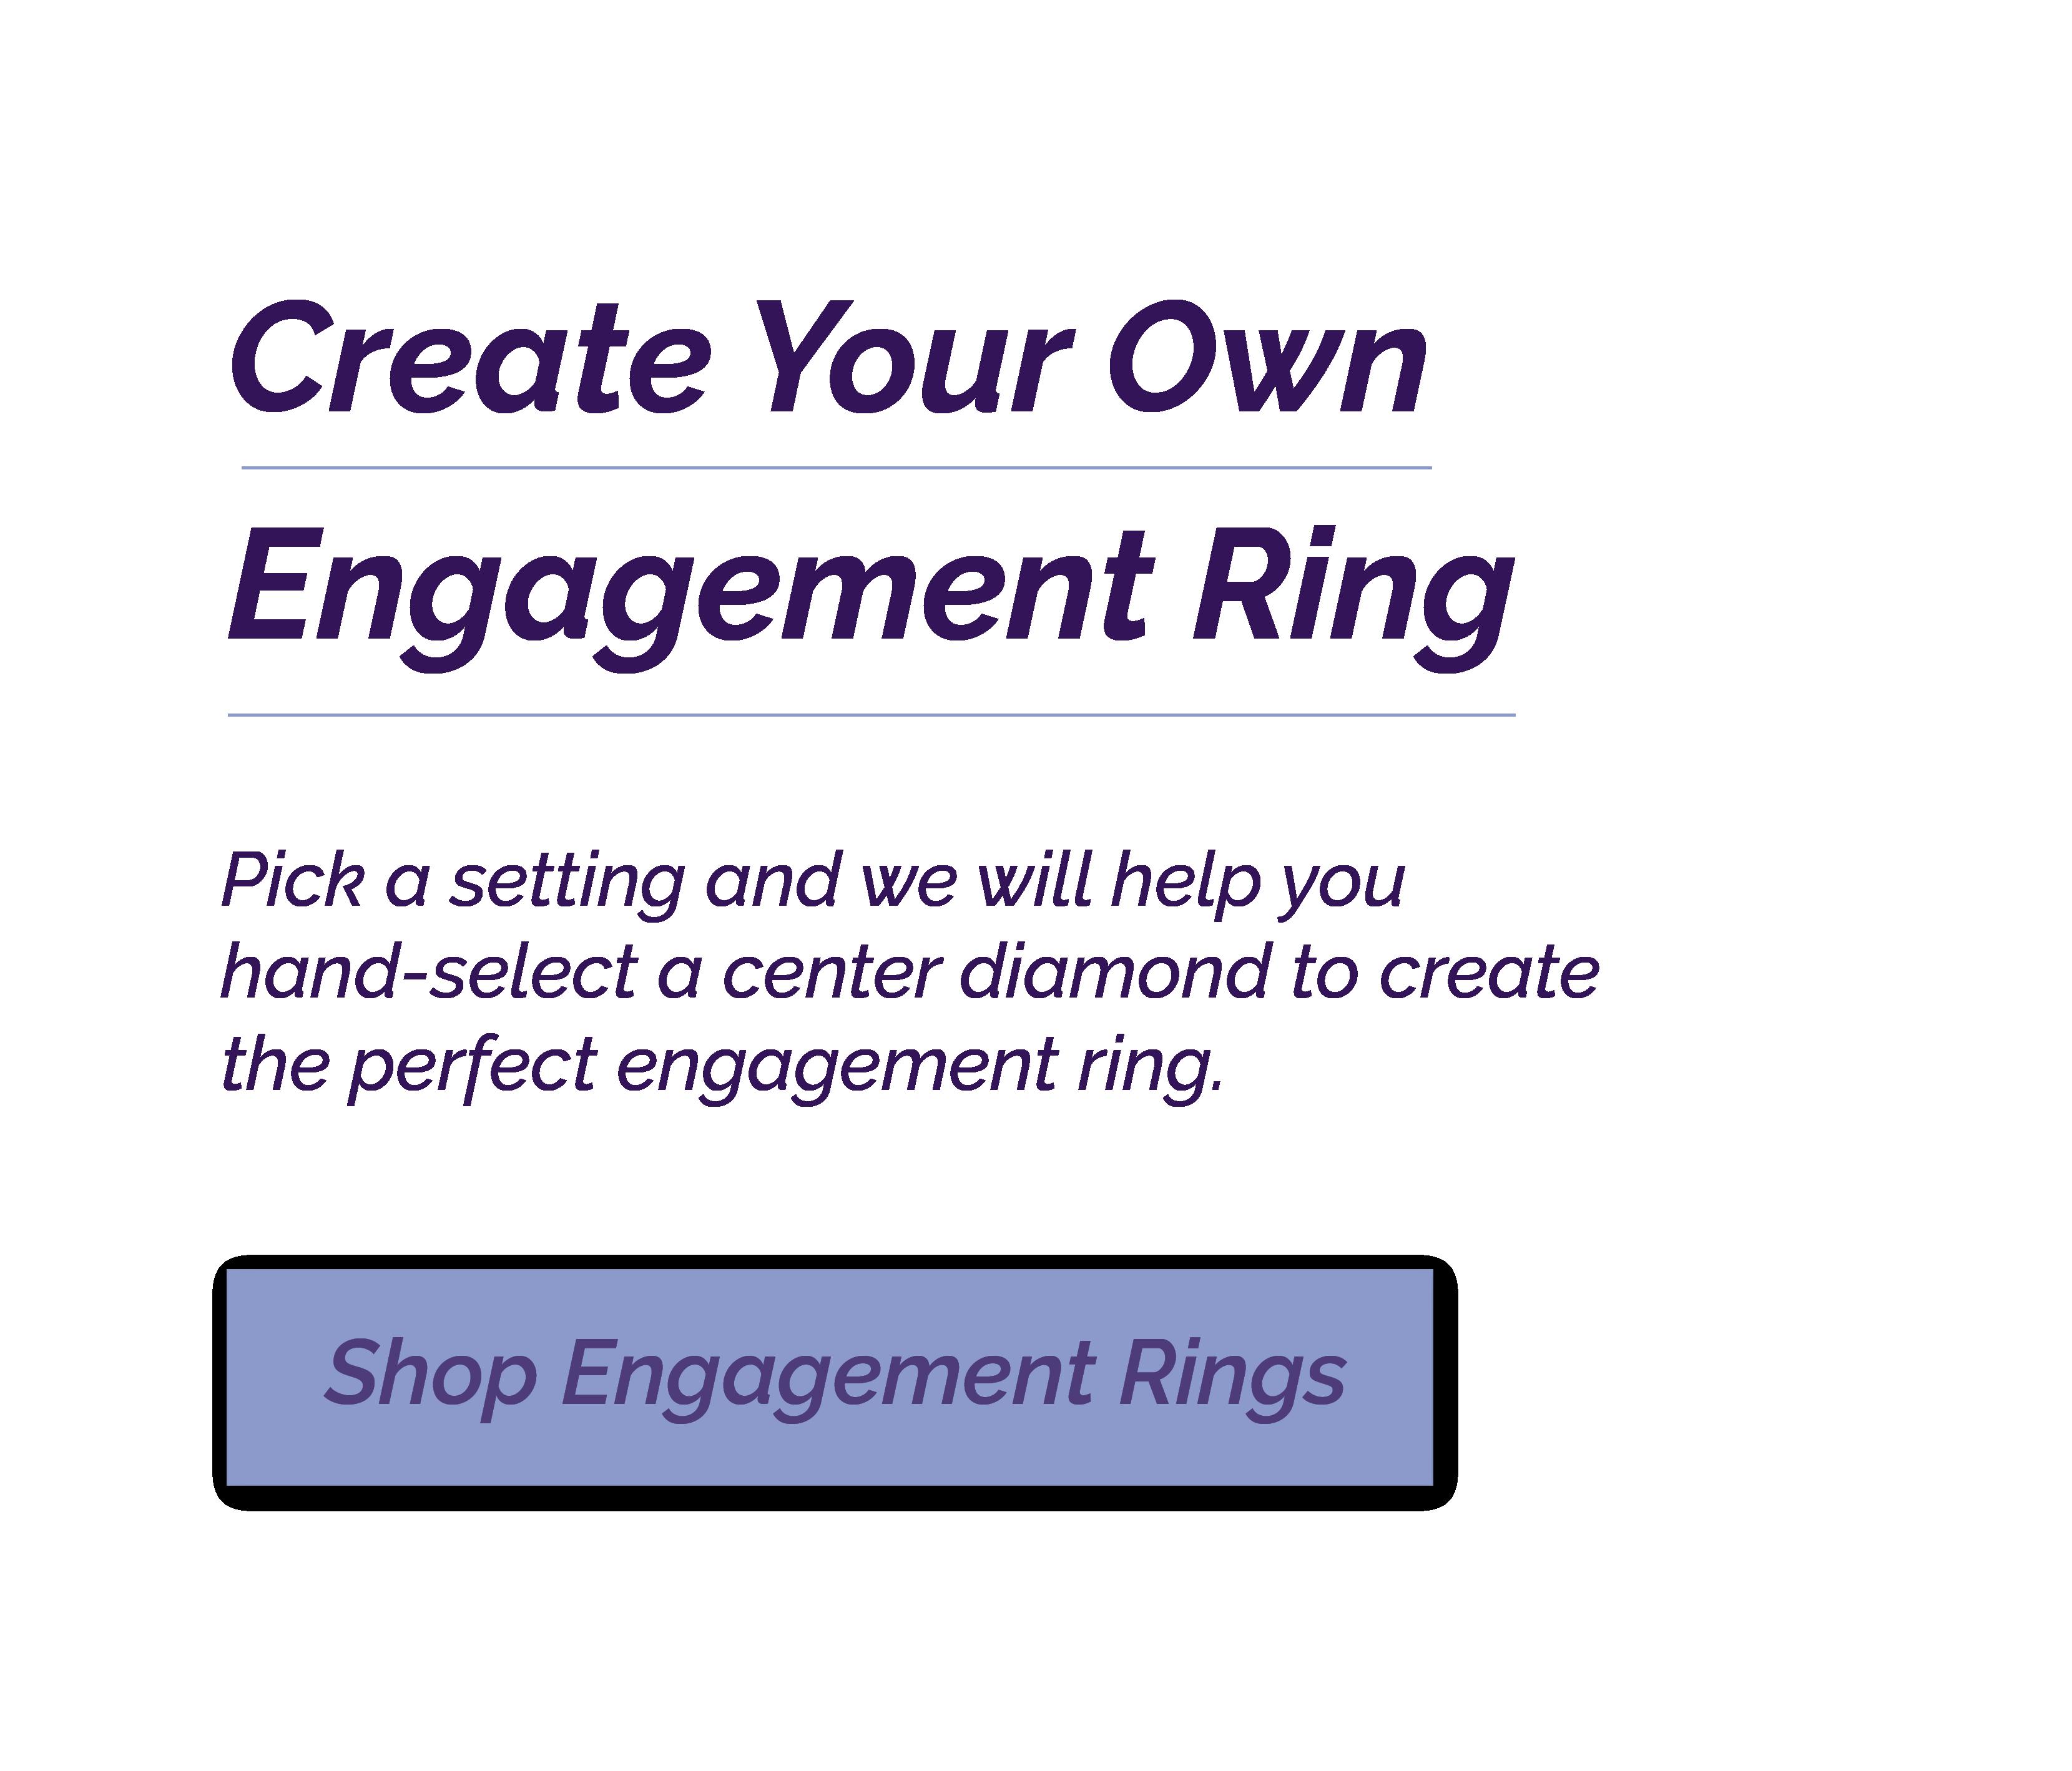 shop_engagement_rings